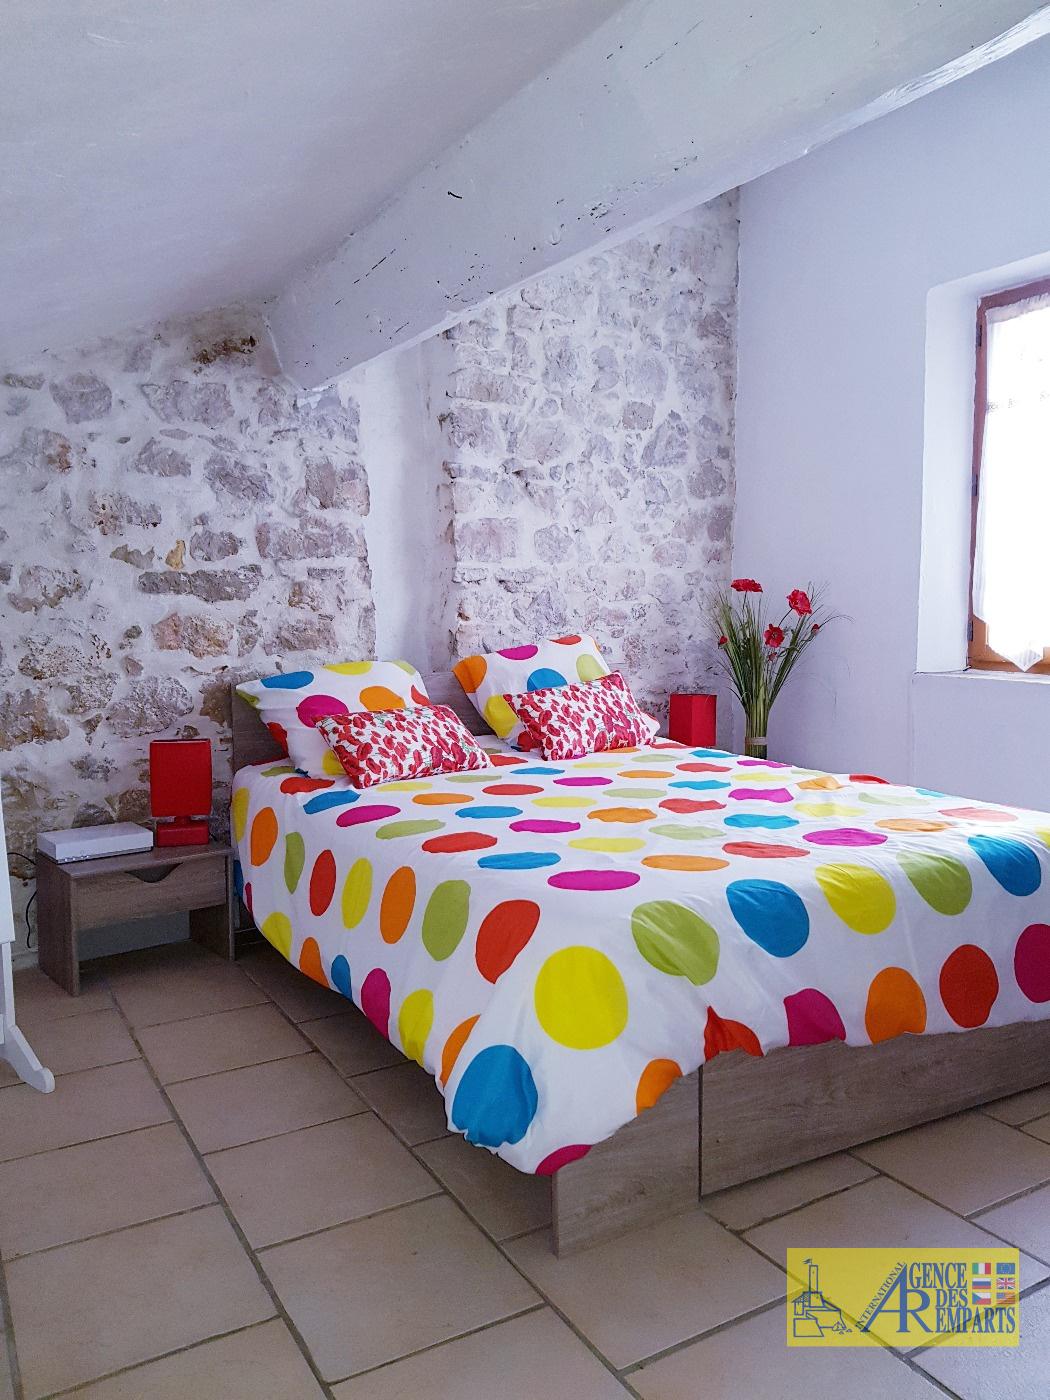 Offres de location Appartements Antibes